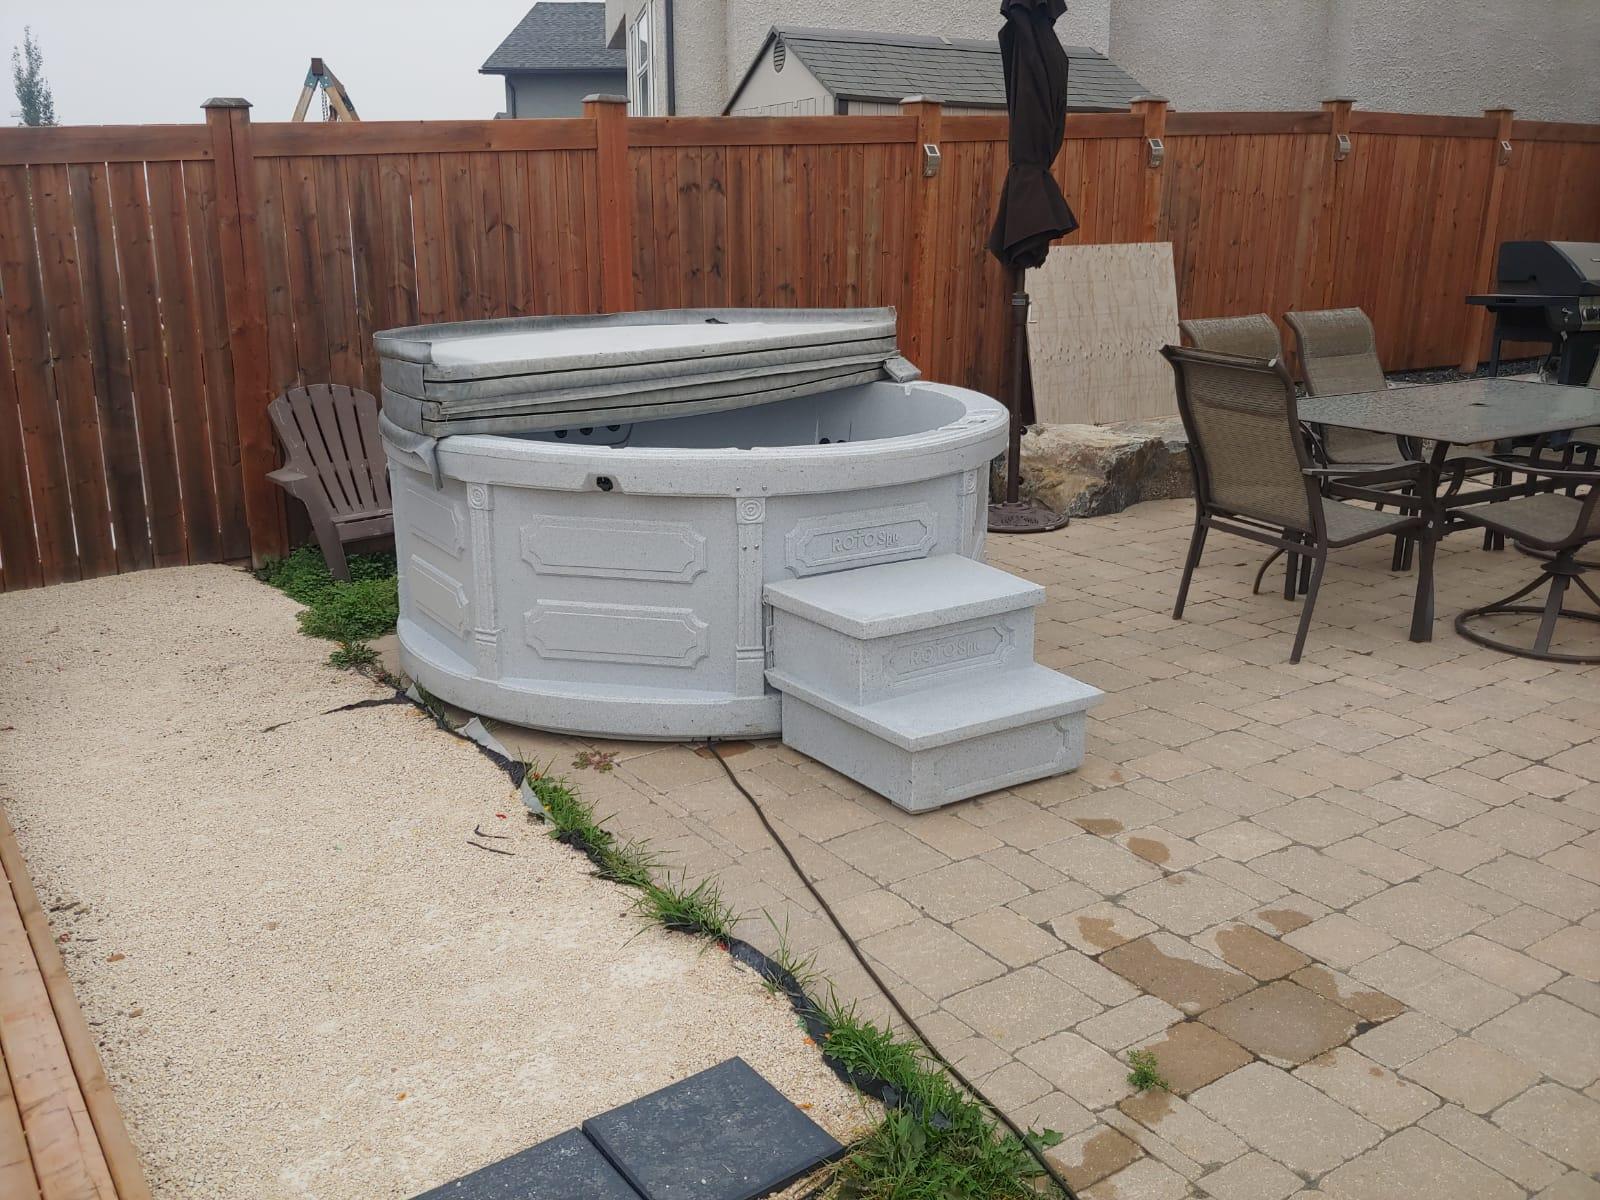 Rent-a-hot-tub-Portage-la-Prairie-Manitoba-The-Funky-Keg